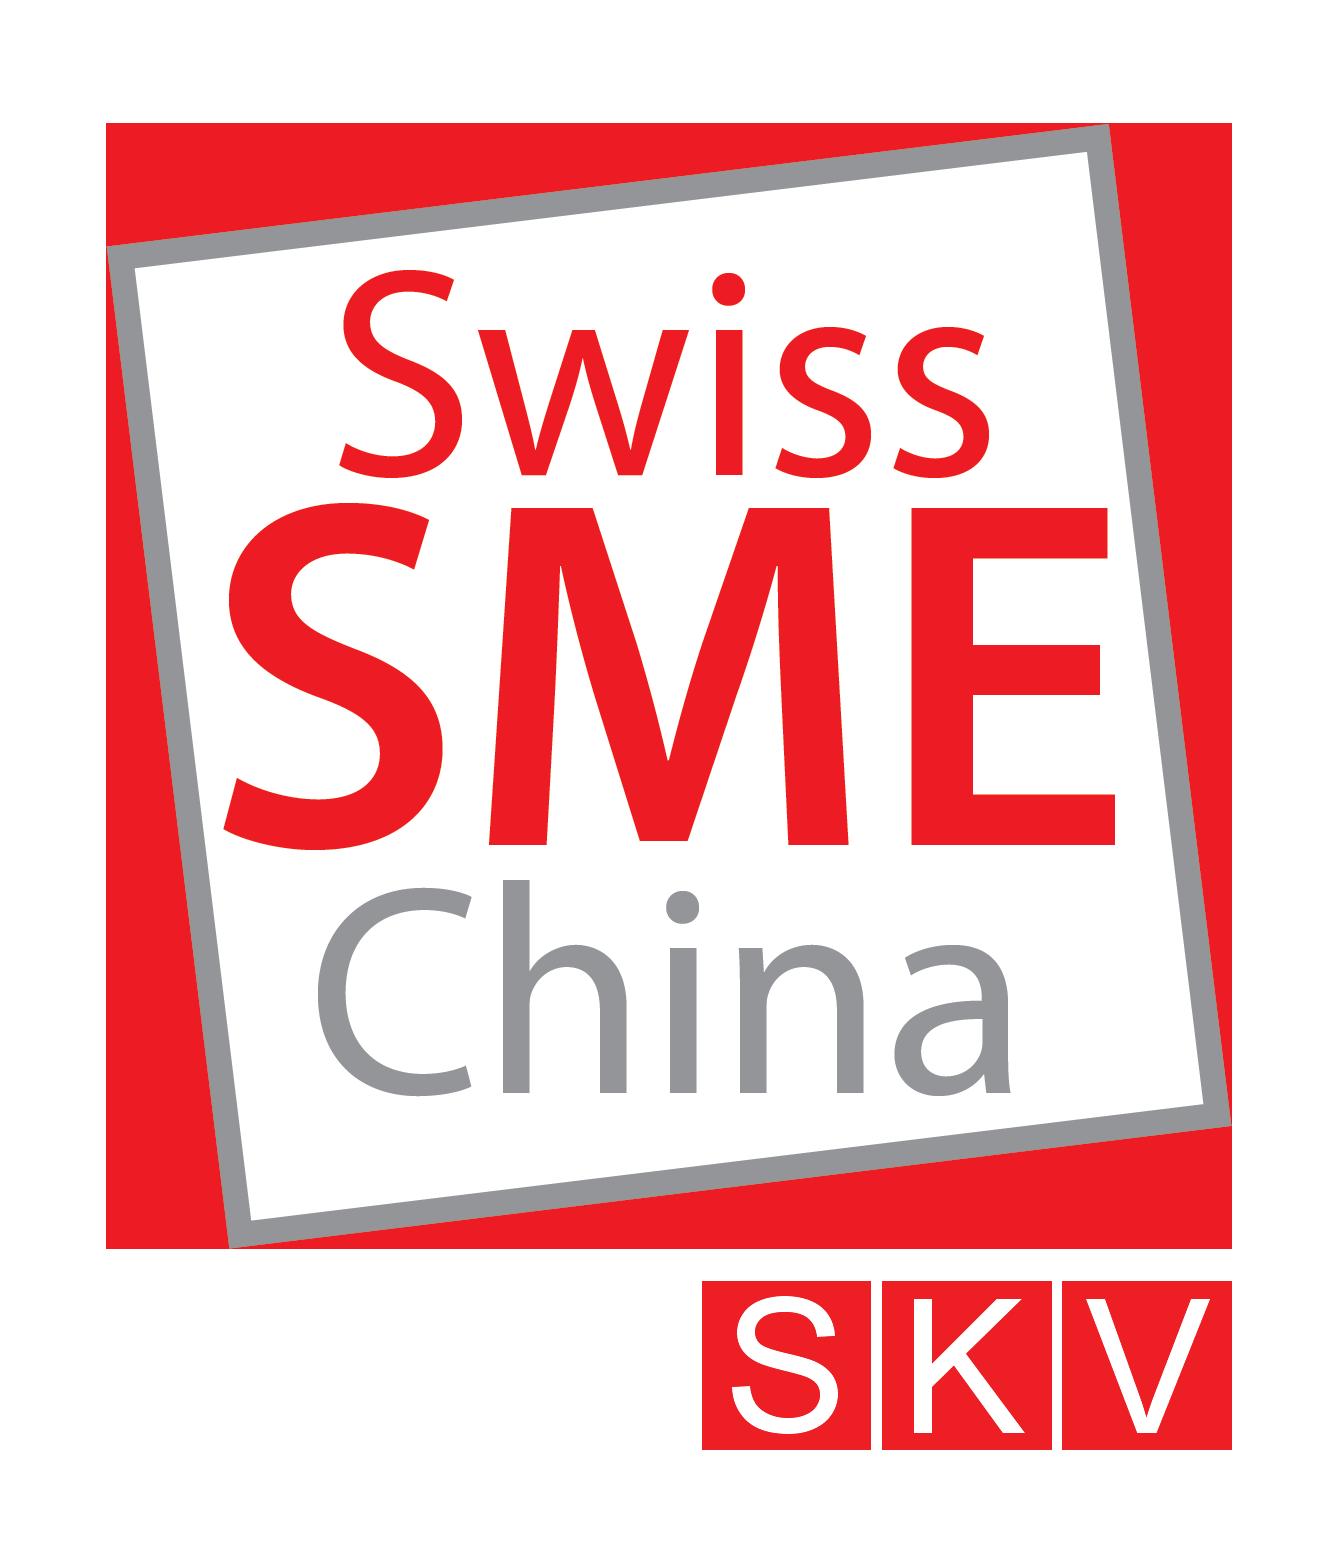 swiss_sme_China_SKV_logo